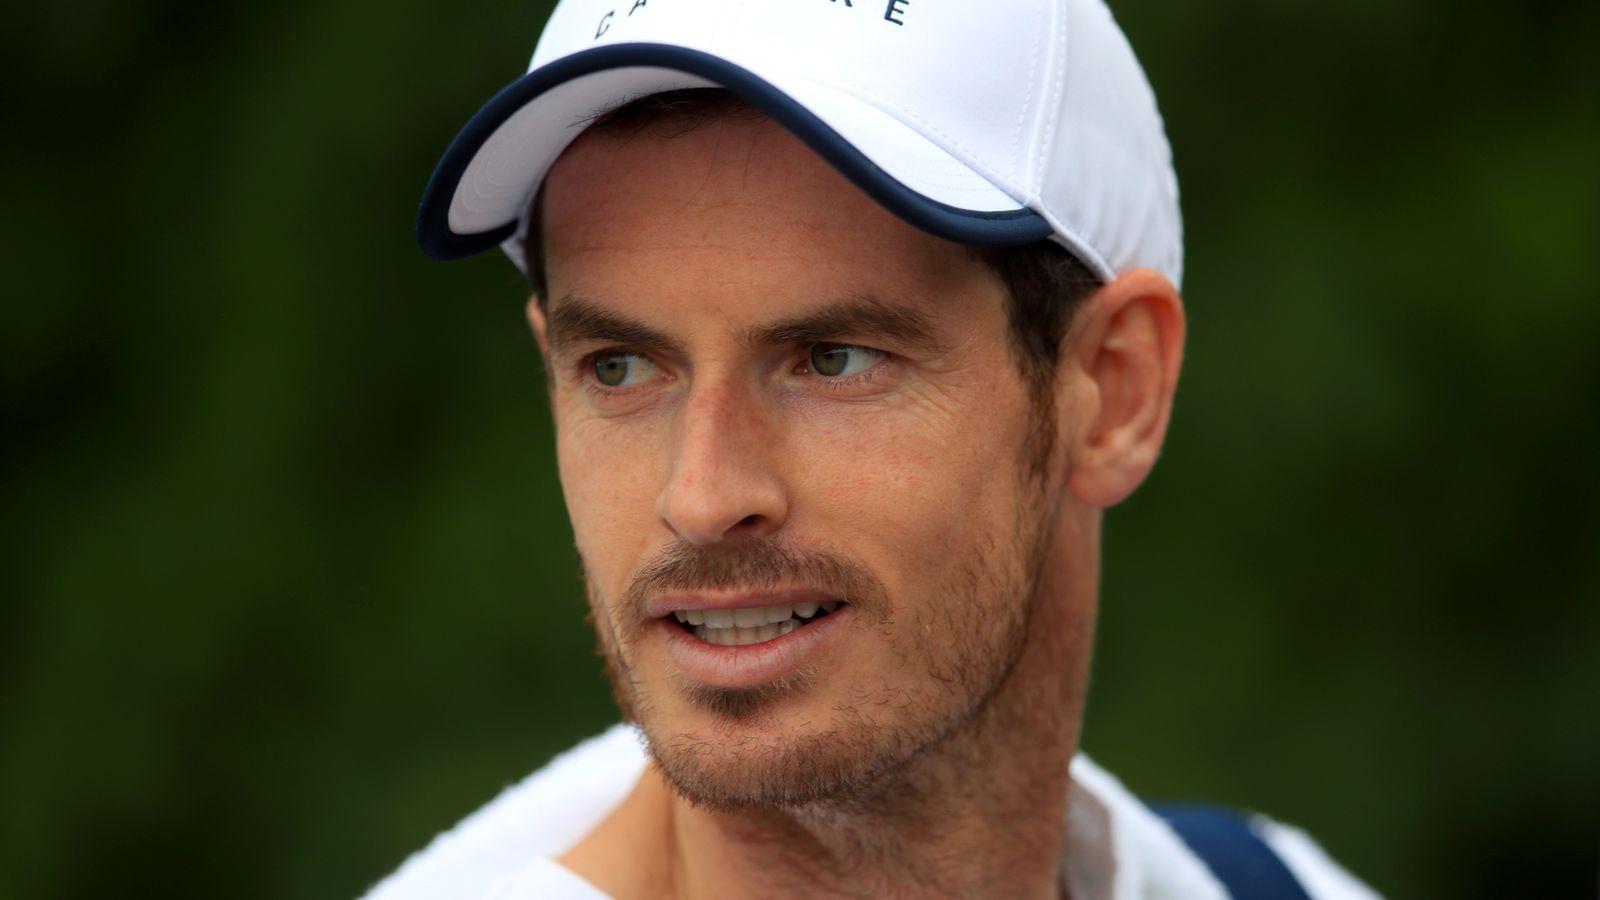 Murray to miss Australian Open